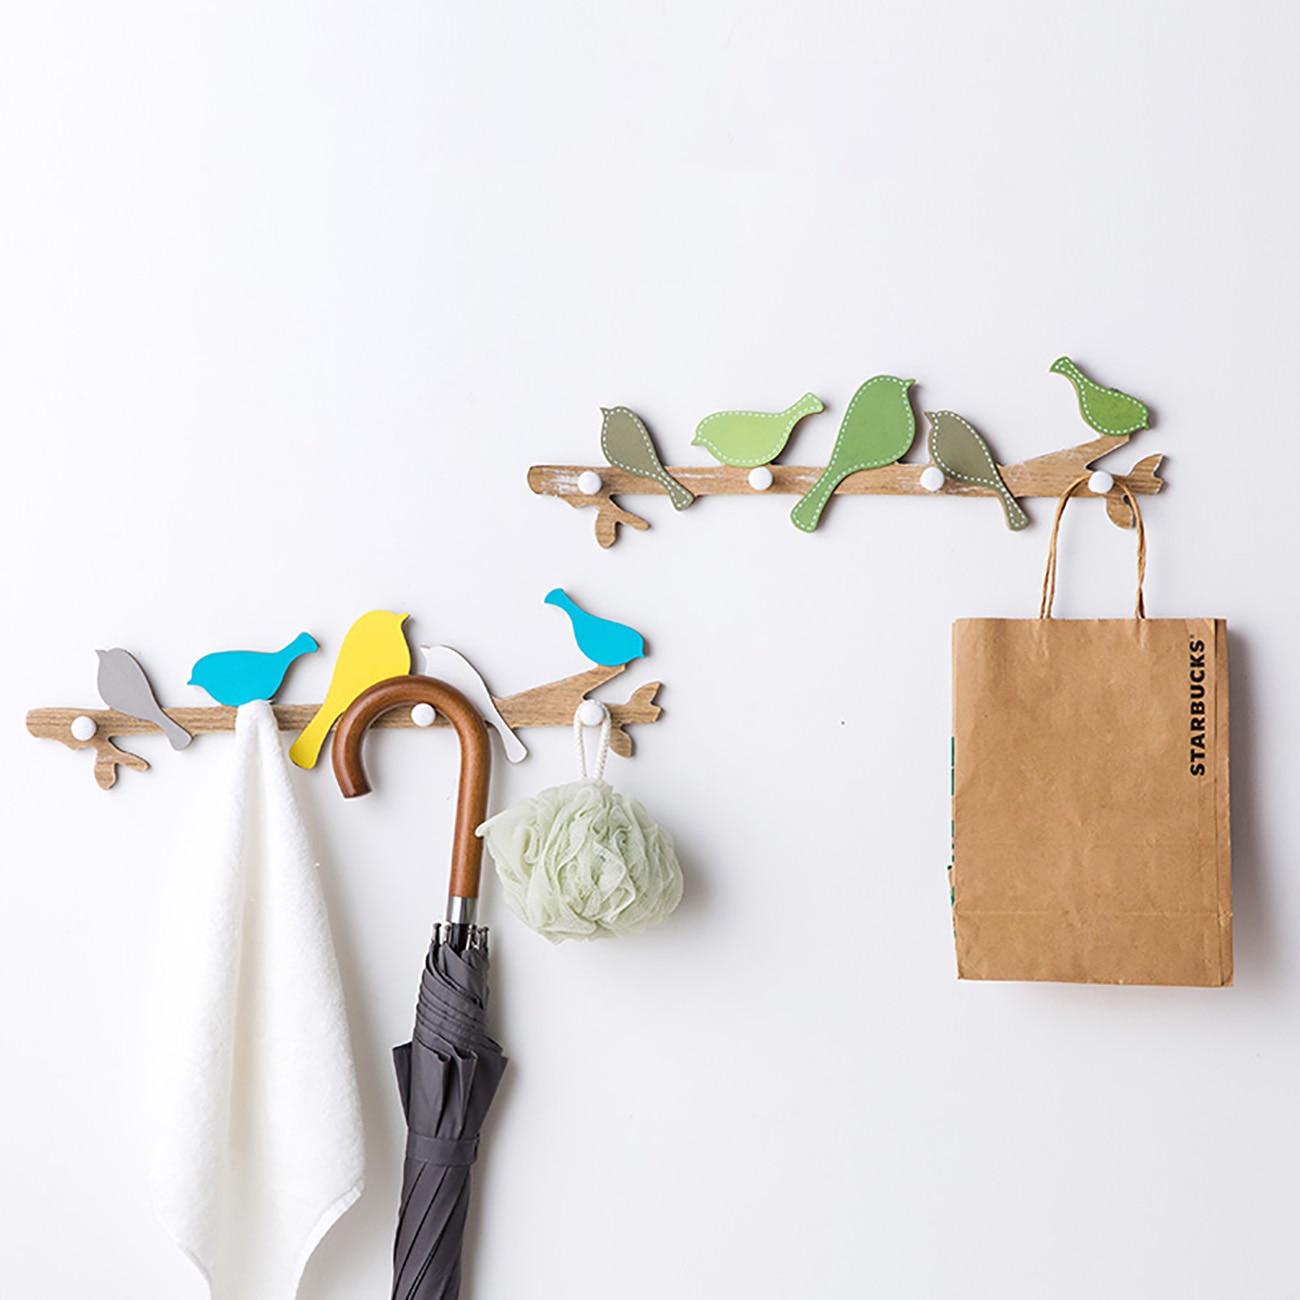 Wall Decorations Resin Bird Hanger Key Coat Hat Clothes Towel Holder Livingroom Bedroom Handbag Creative Holder Home Accessories